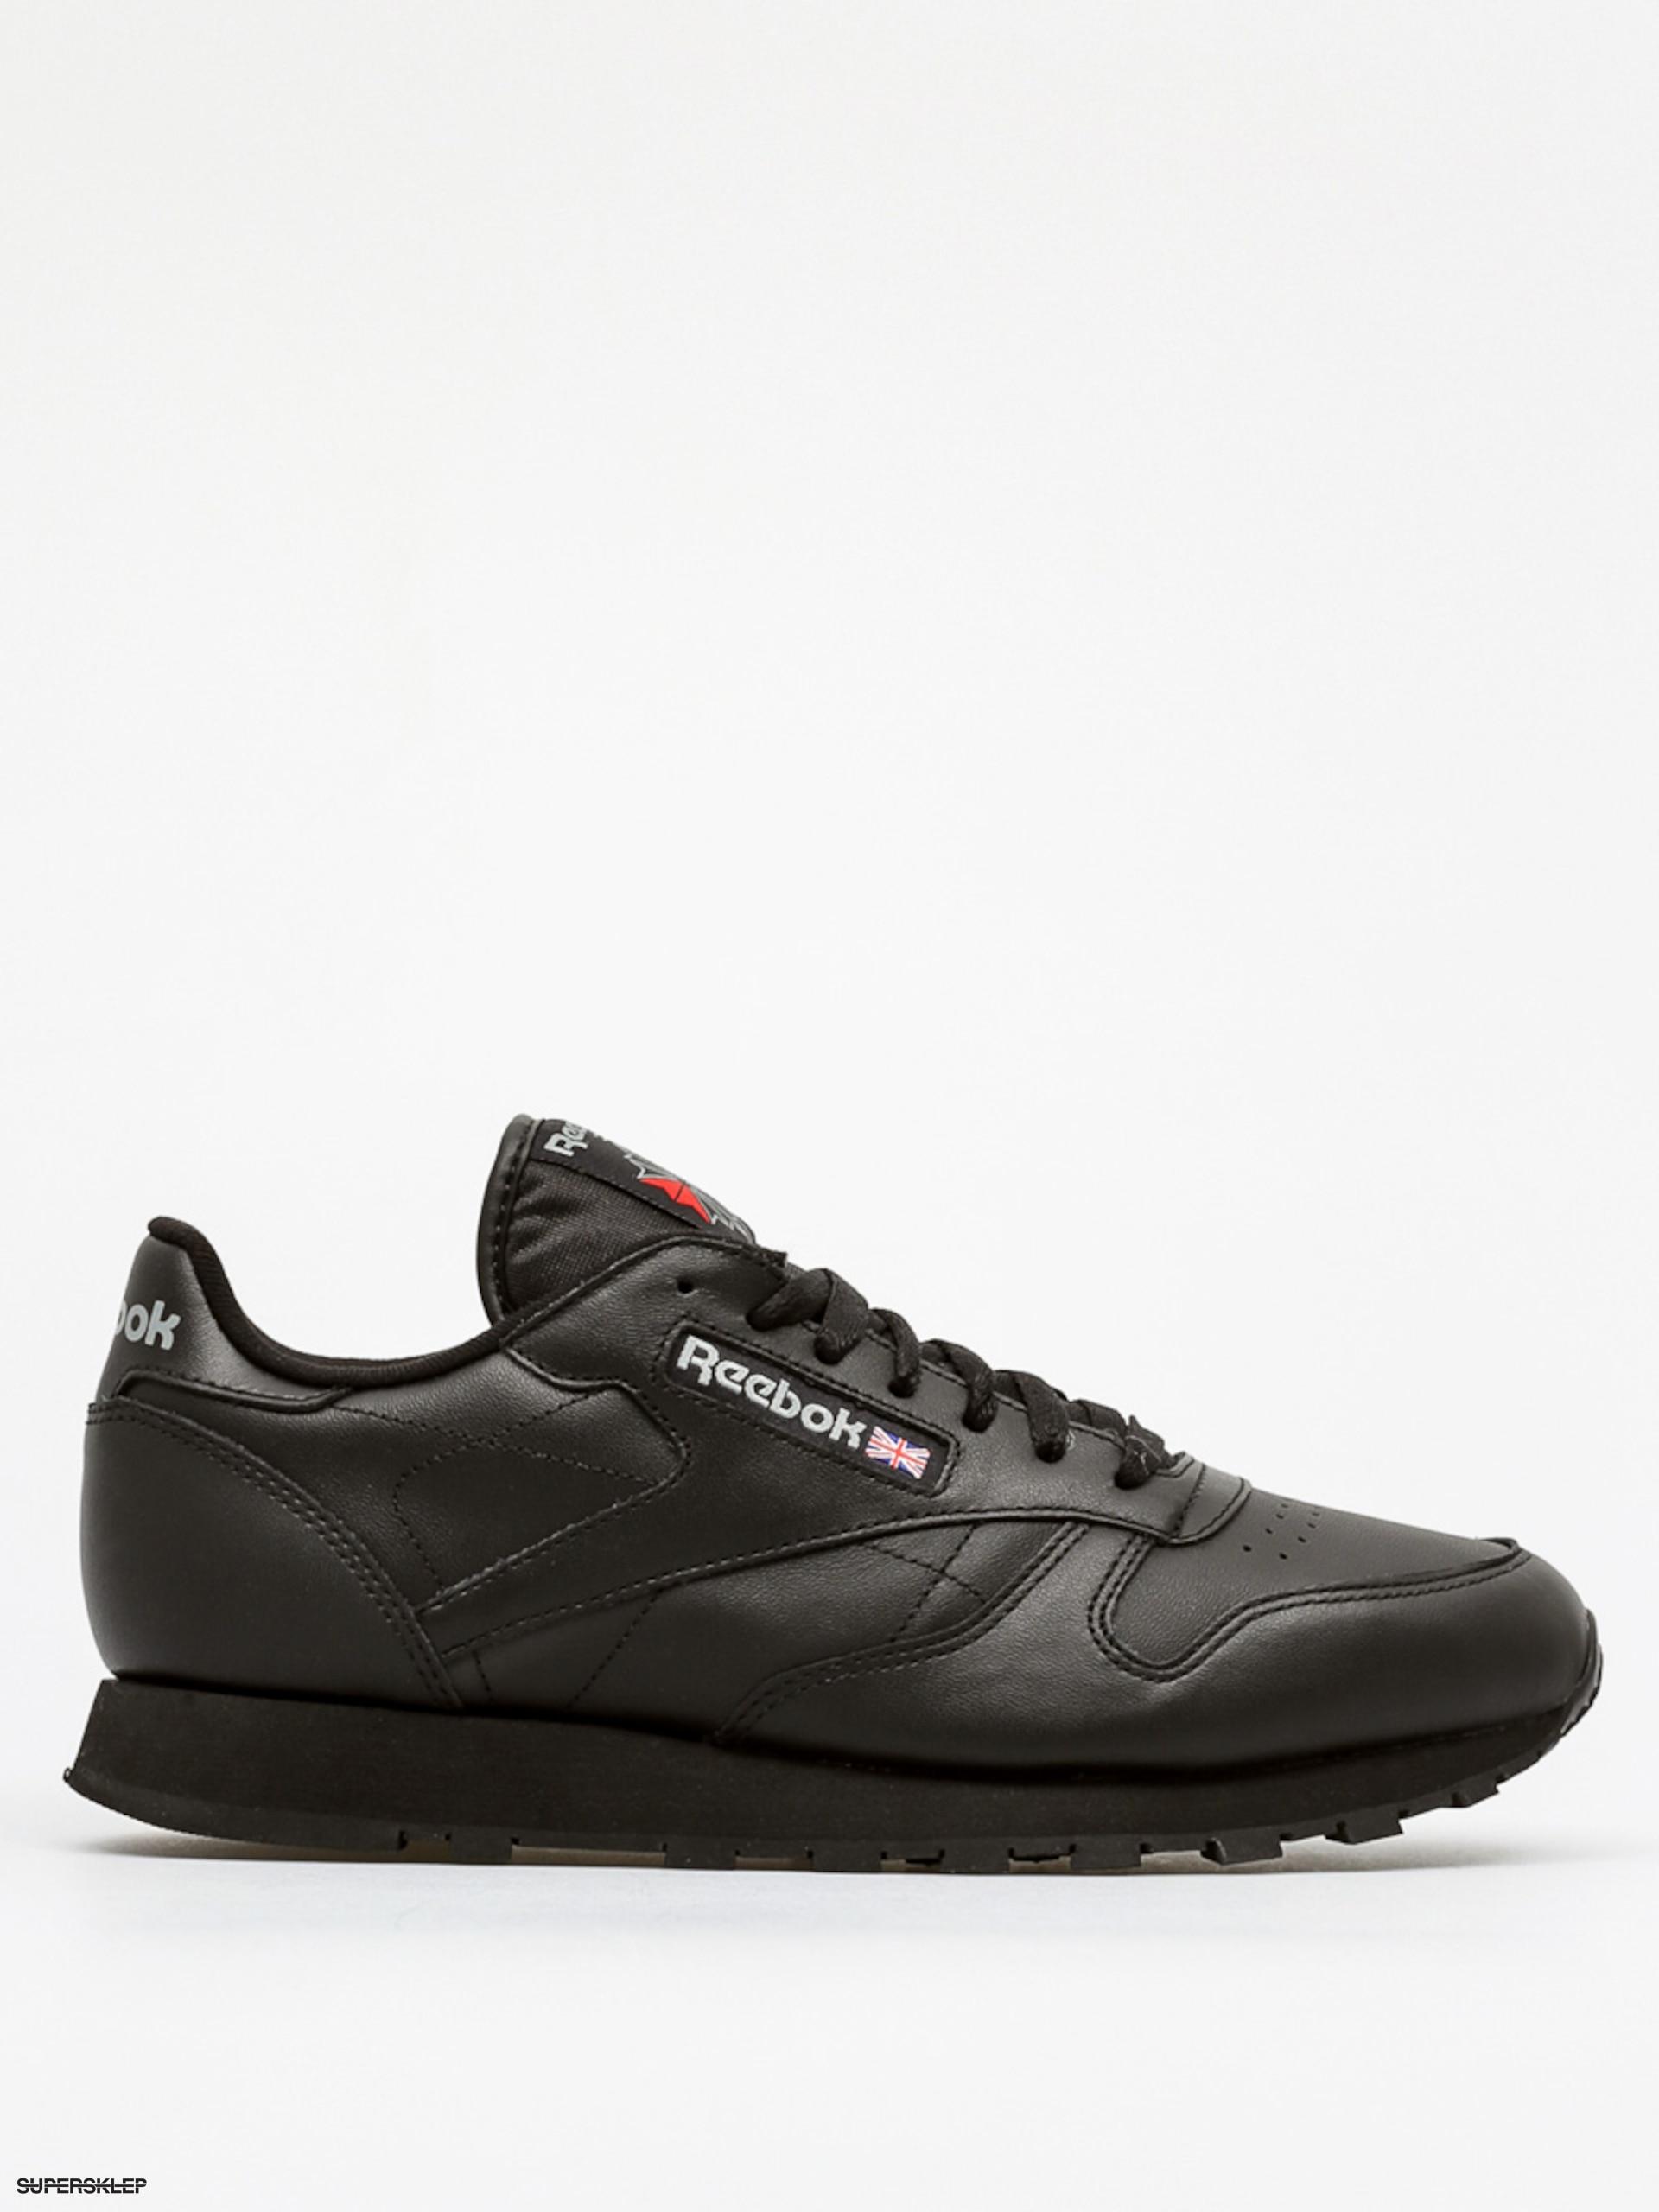 d87c2e37 Buty Reebok Classic Leather (black)